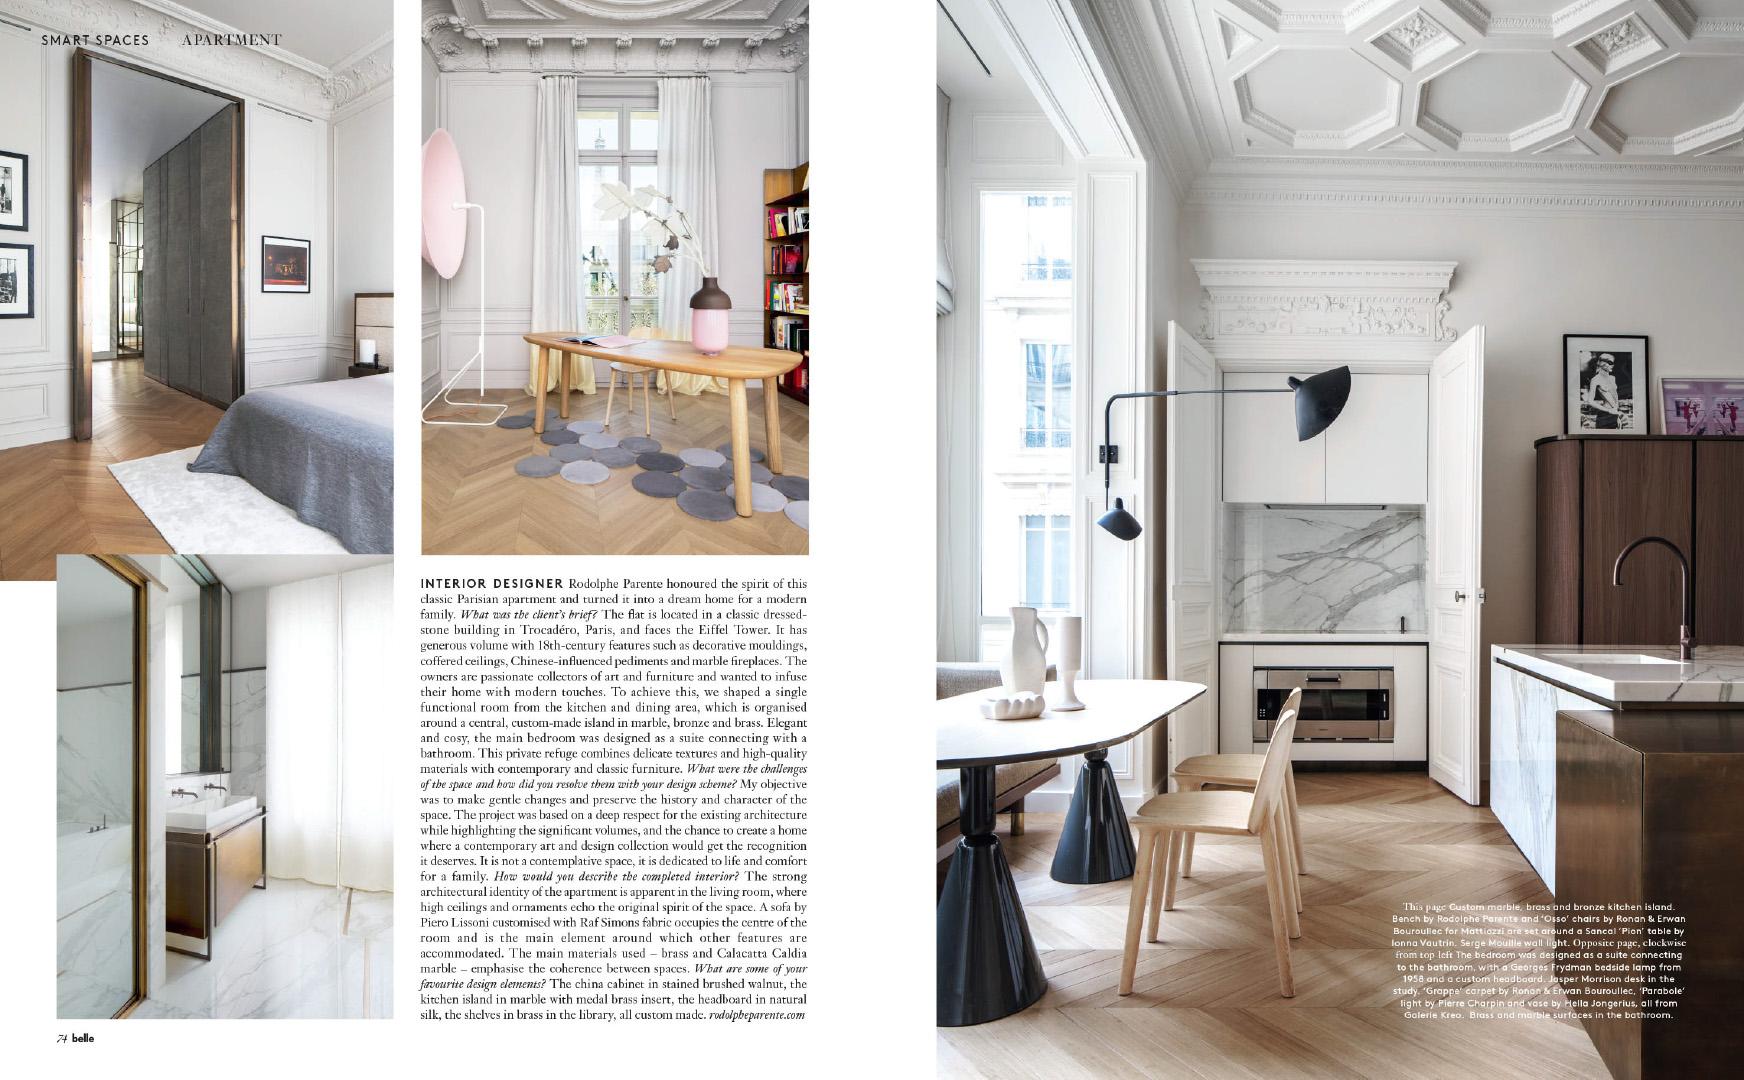 Rodolphe-Parente-Belle-Magazine-2016-04